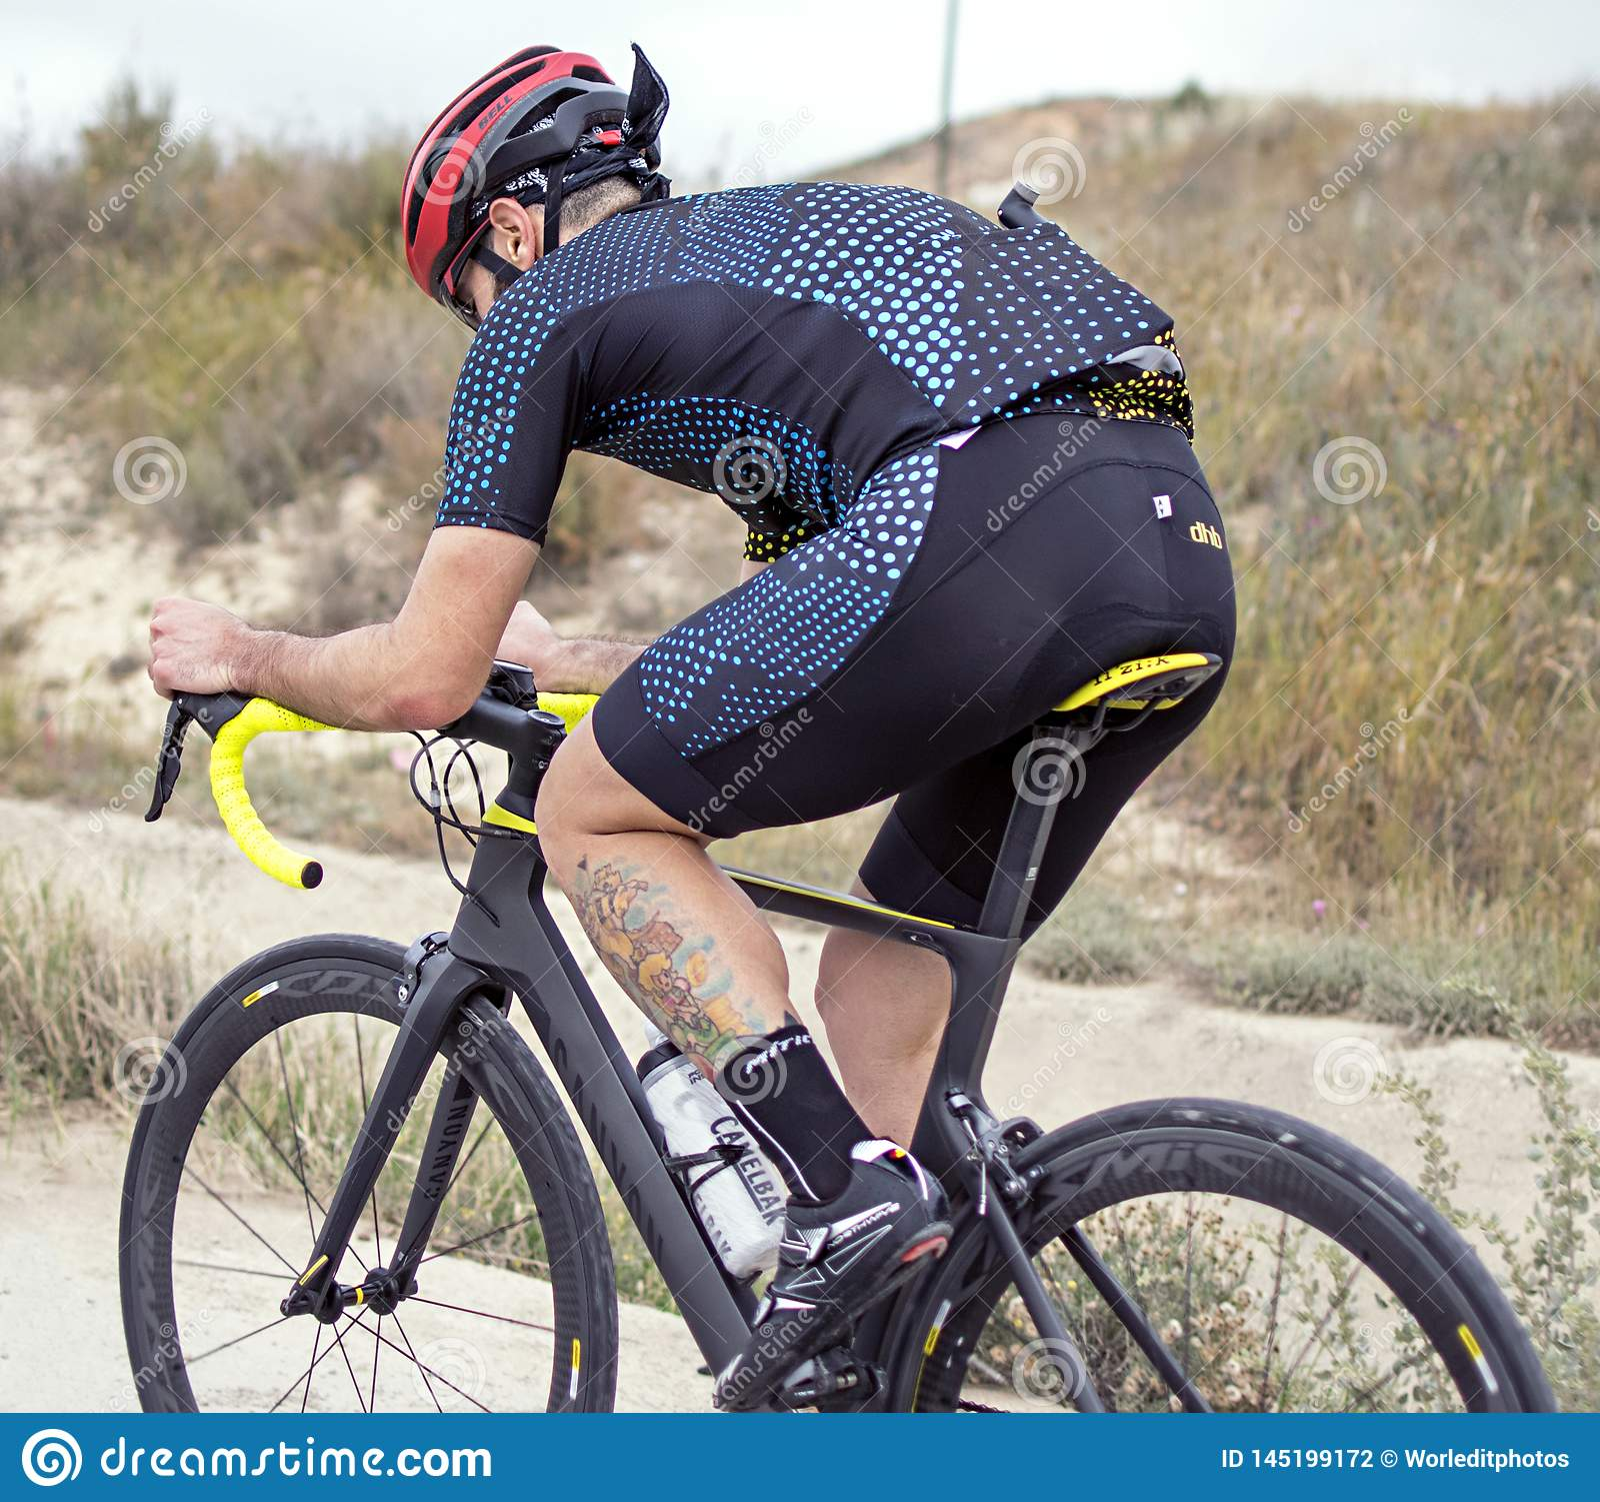 Murcia, Ισπανία, στις 17 Απριλίου 2019: Ο νεαρός άνδρας οδηγά το ποδήλατο στη